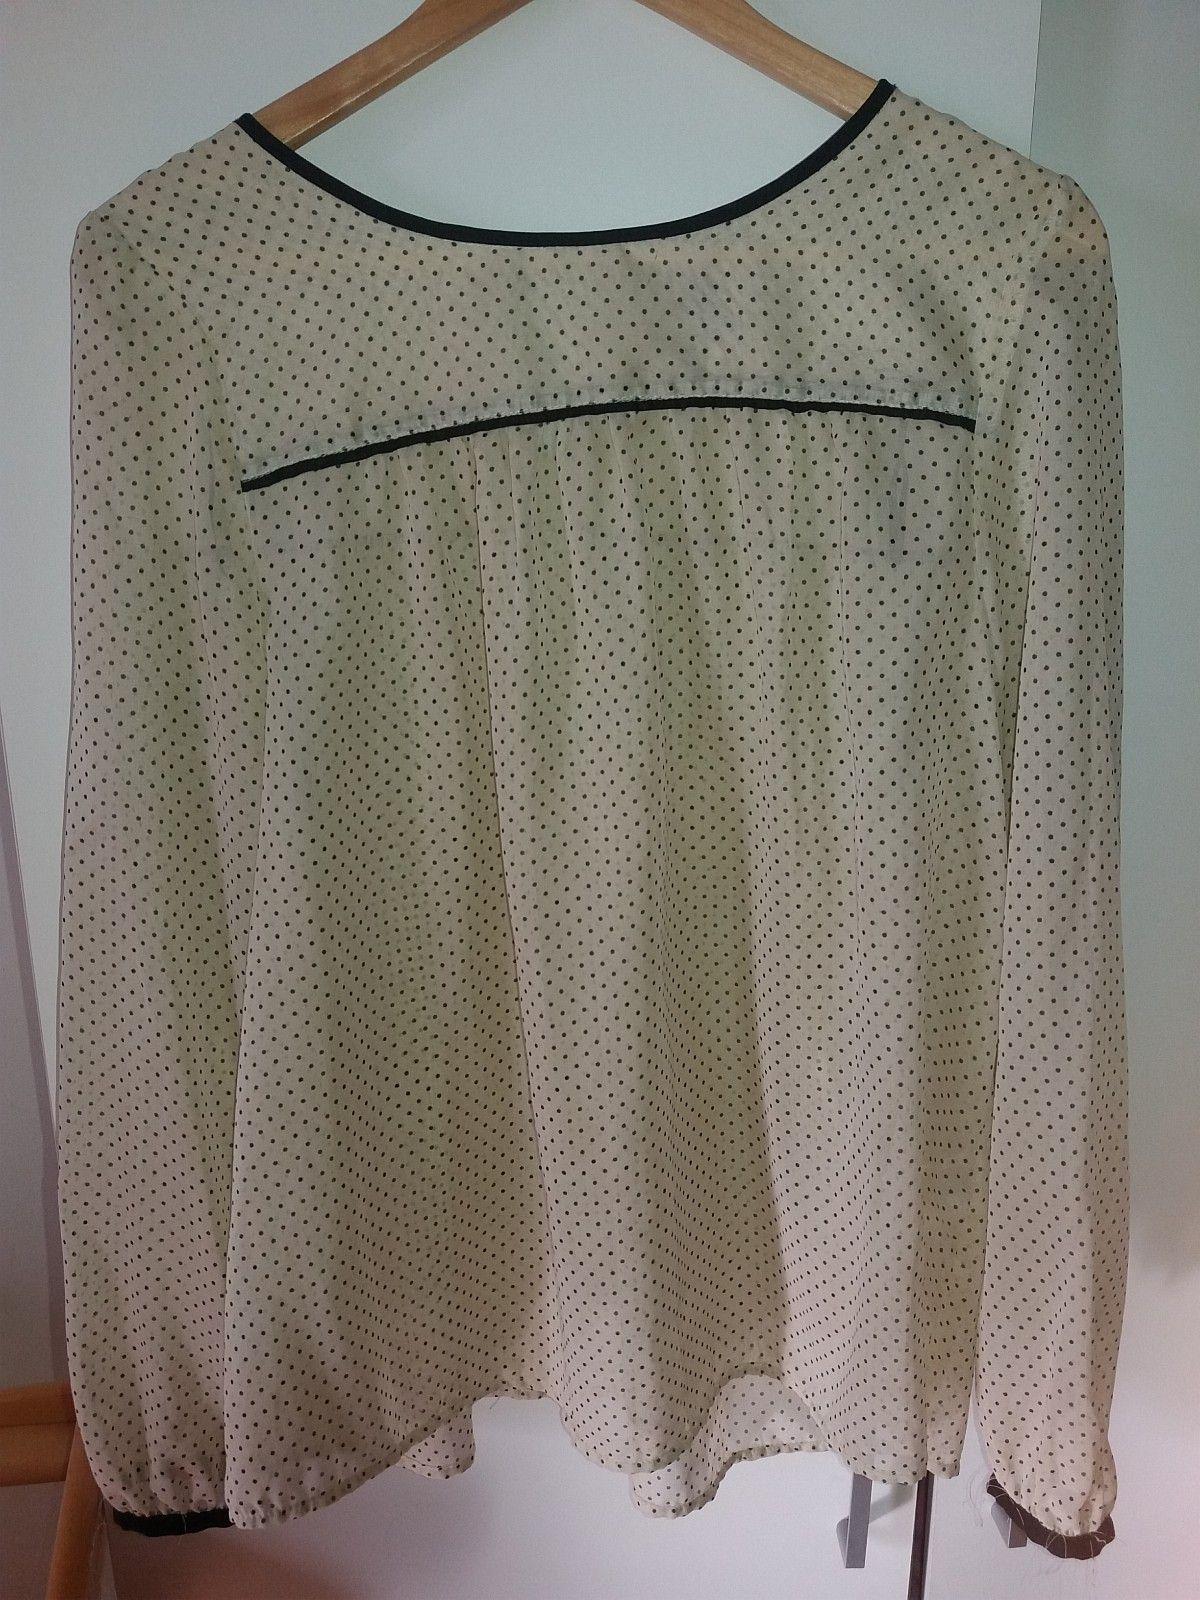 blouse cream color str 38 - Oslo  - blouse from H&M seldom use..... - Oslo